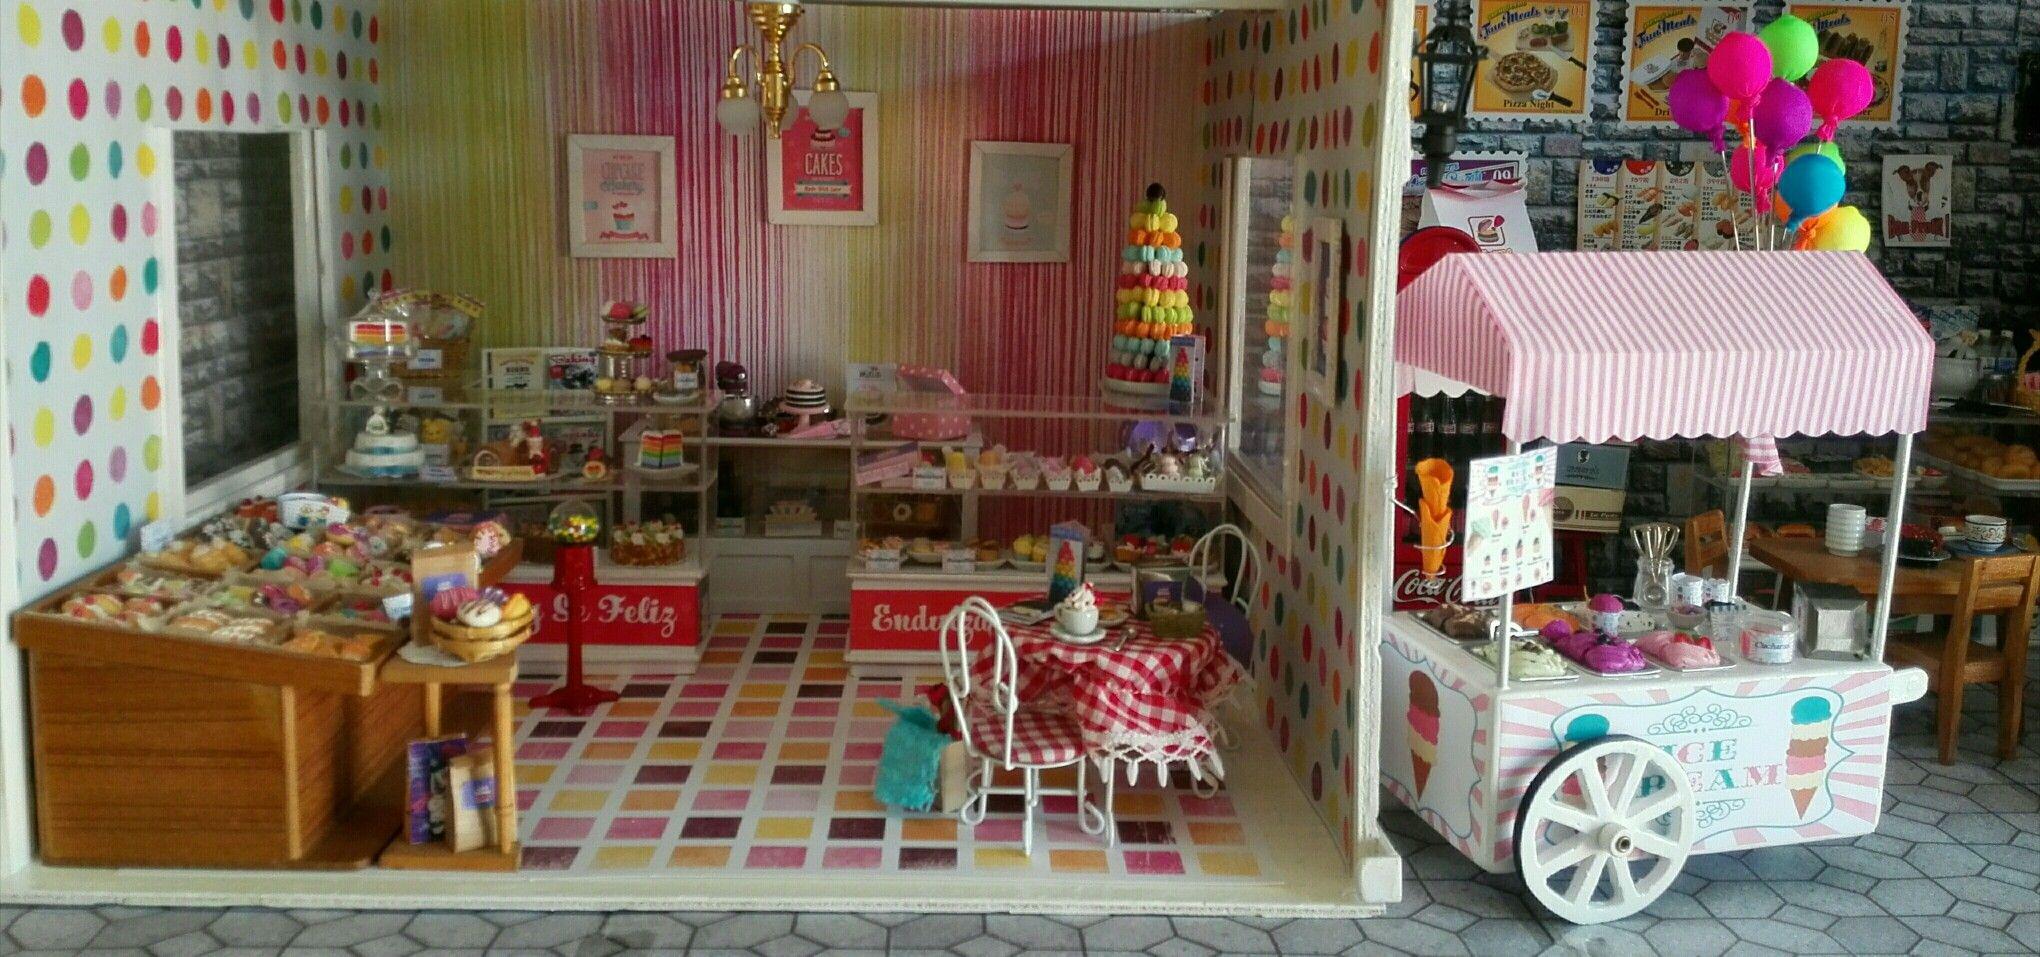 Carrito de helados en miniatura ice cream cart dollhouse miniature pasteleria bakery cupcake